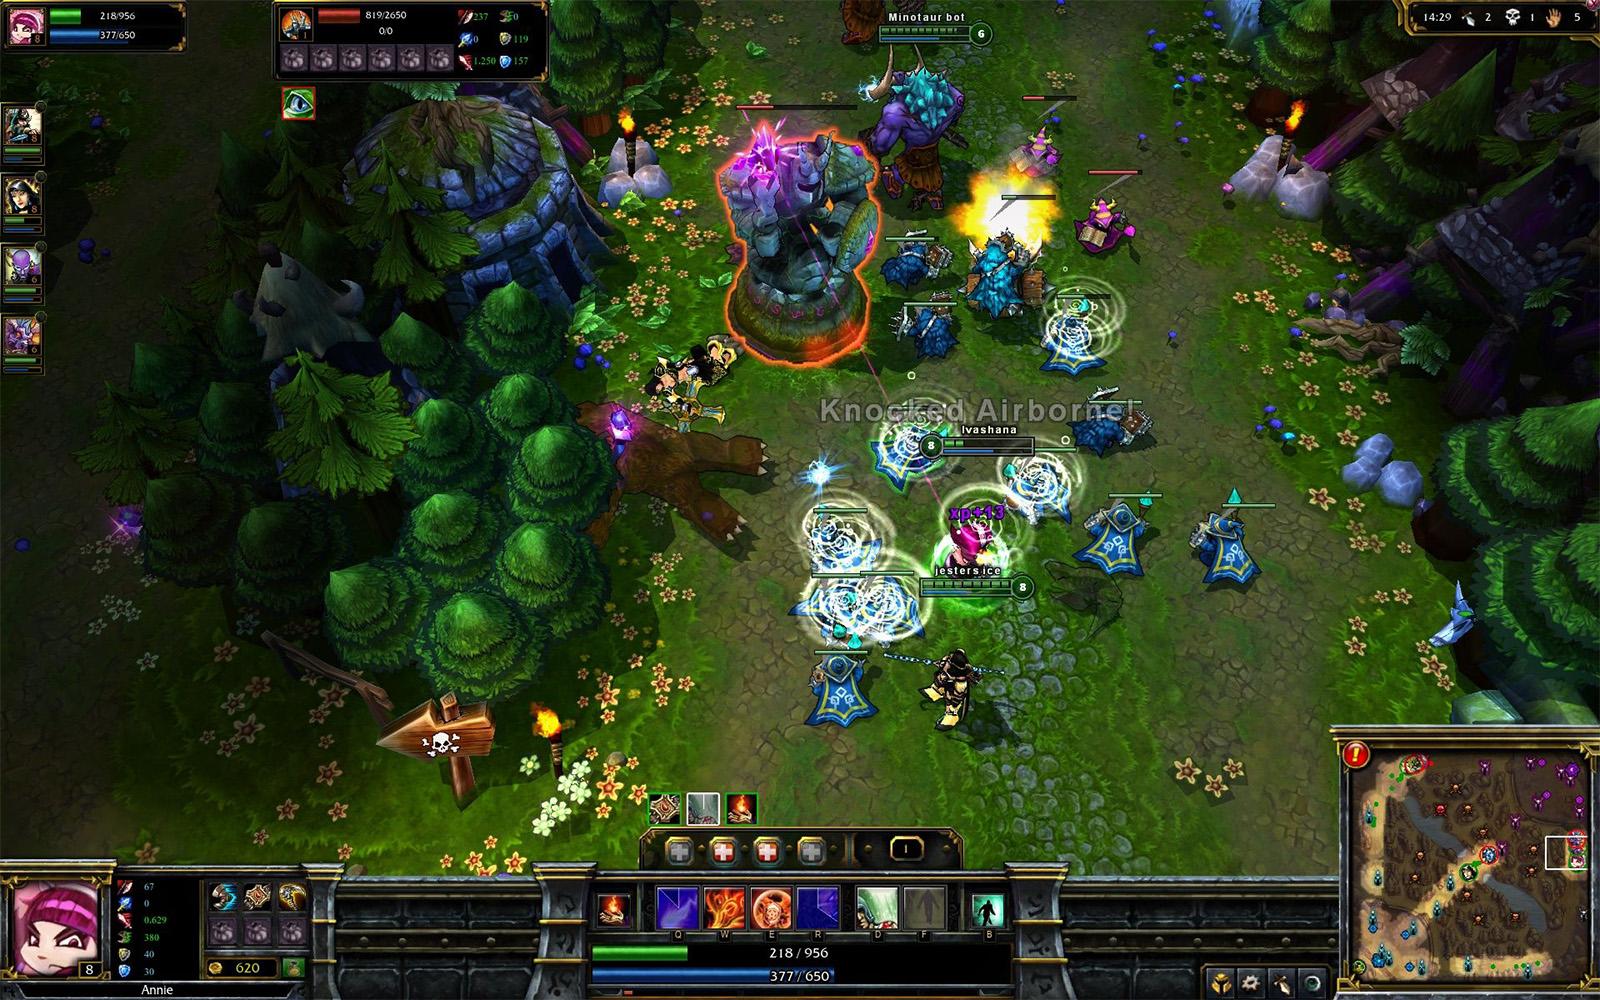 Riot Gamesの人気タイトル『League of Legends』のプレイ画面